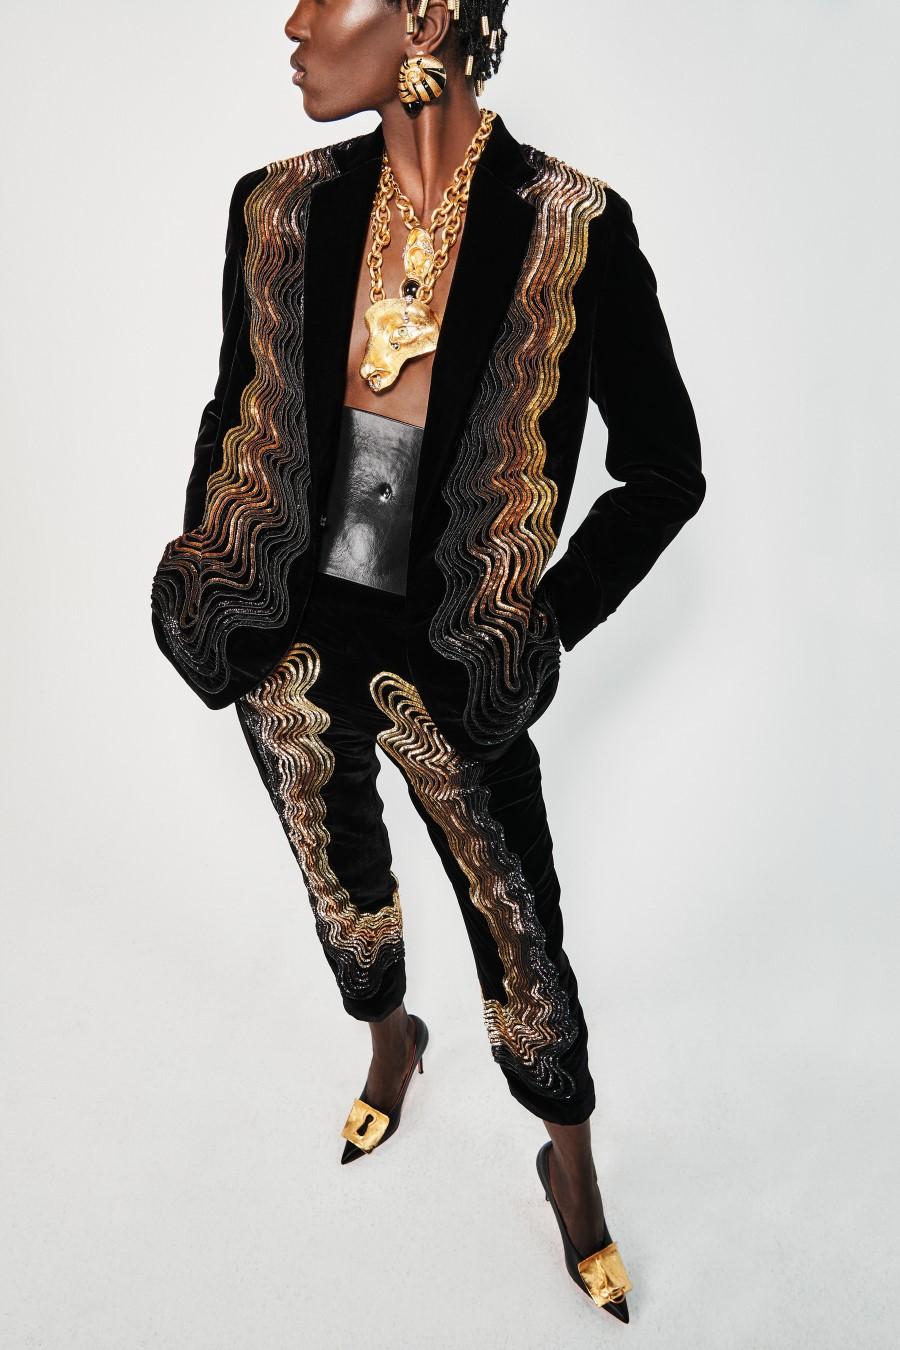 Schiaparelli Fall Winter 2021 - Paris Fashion Week